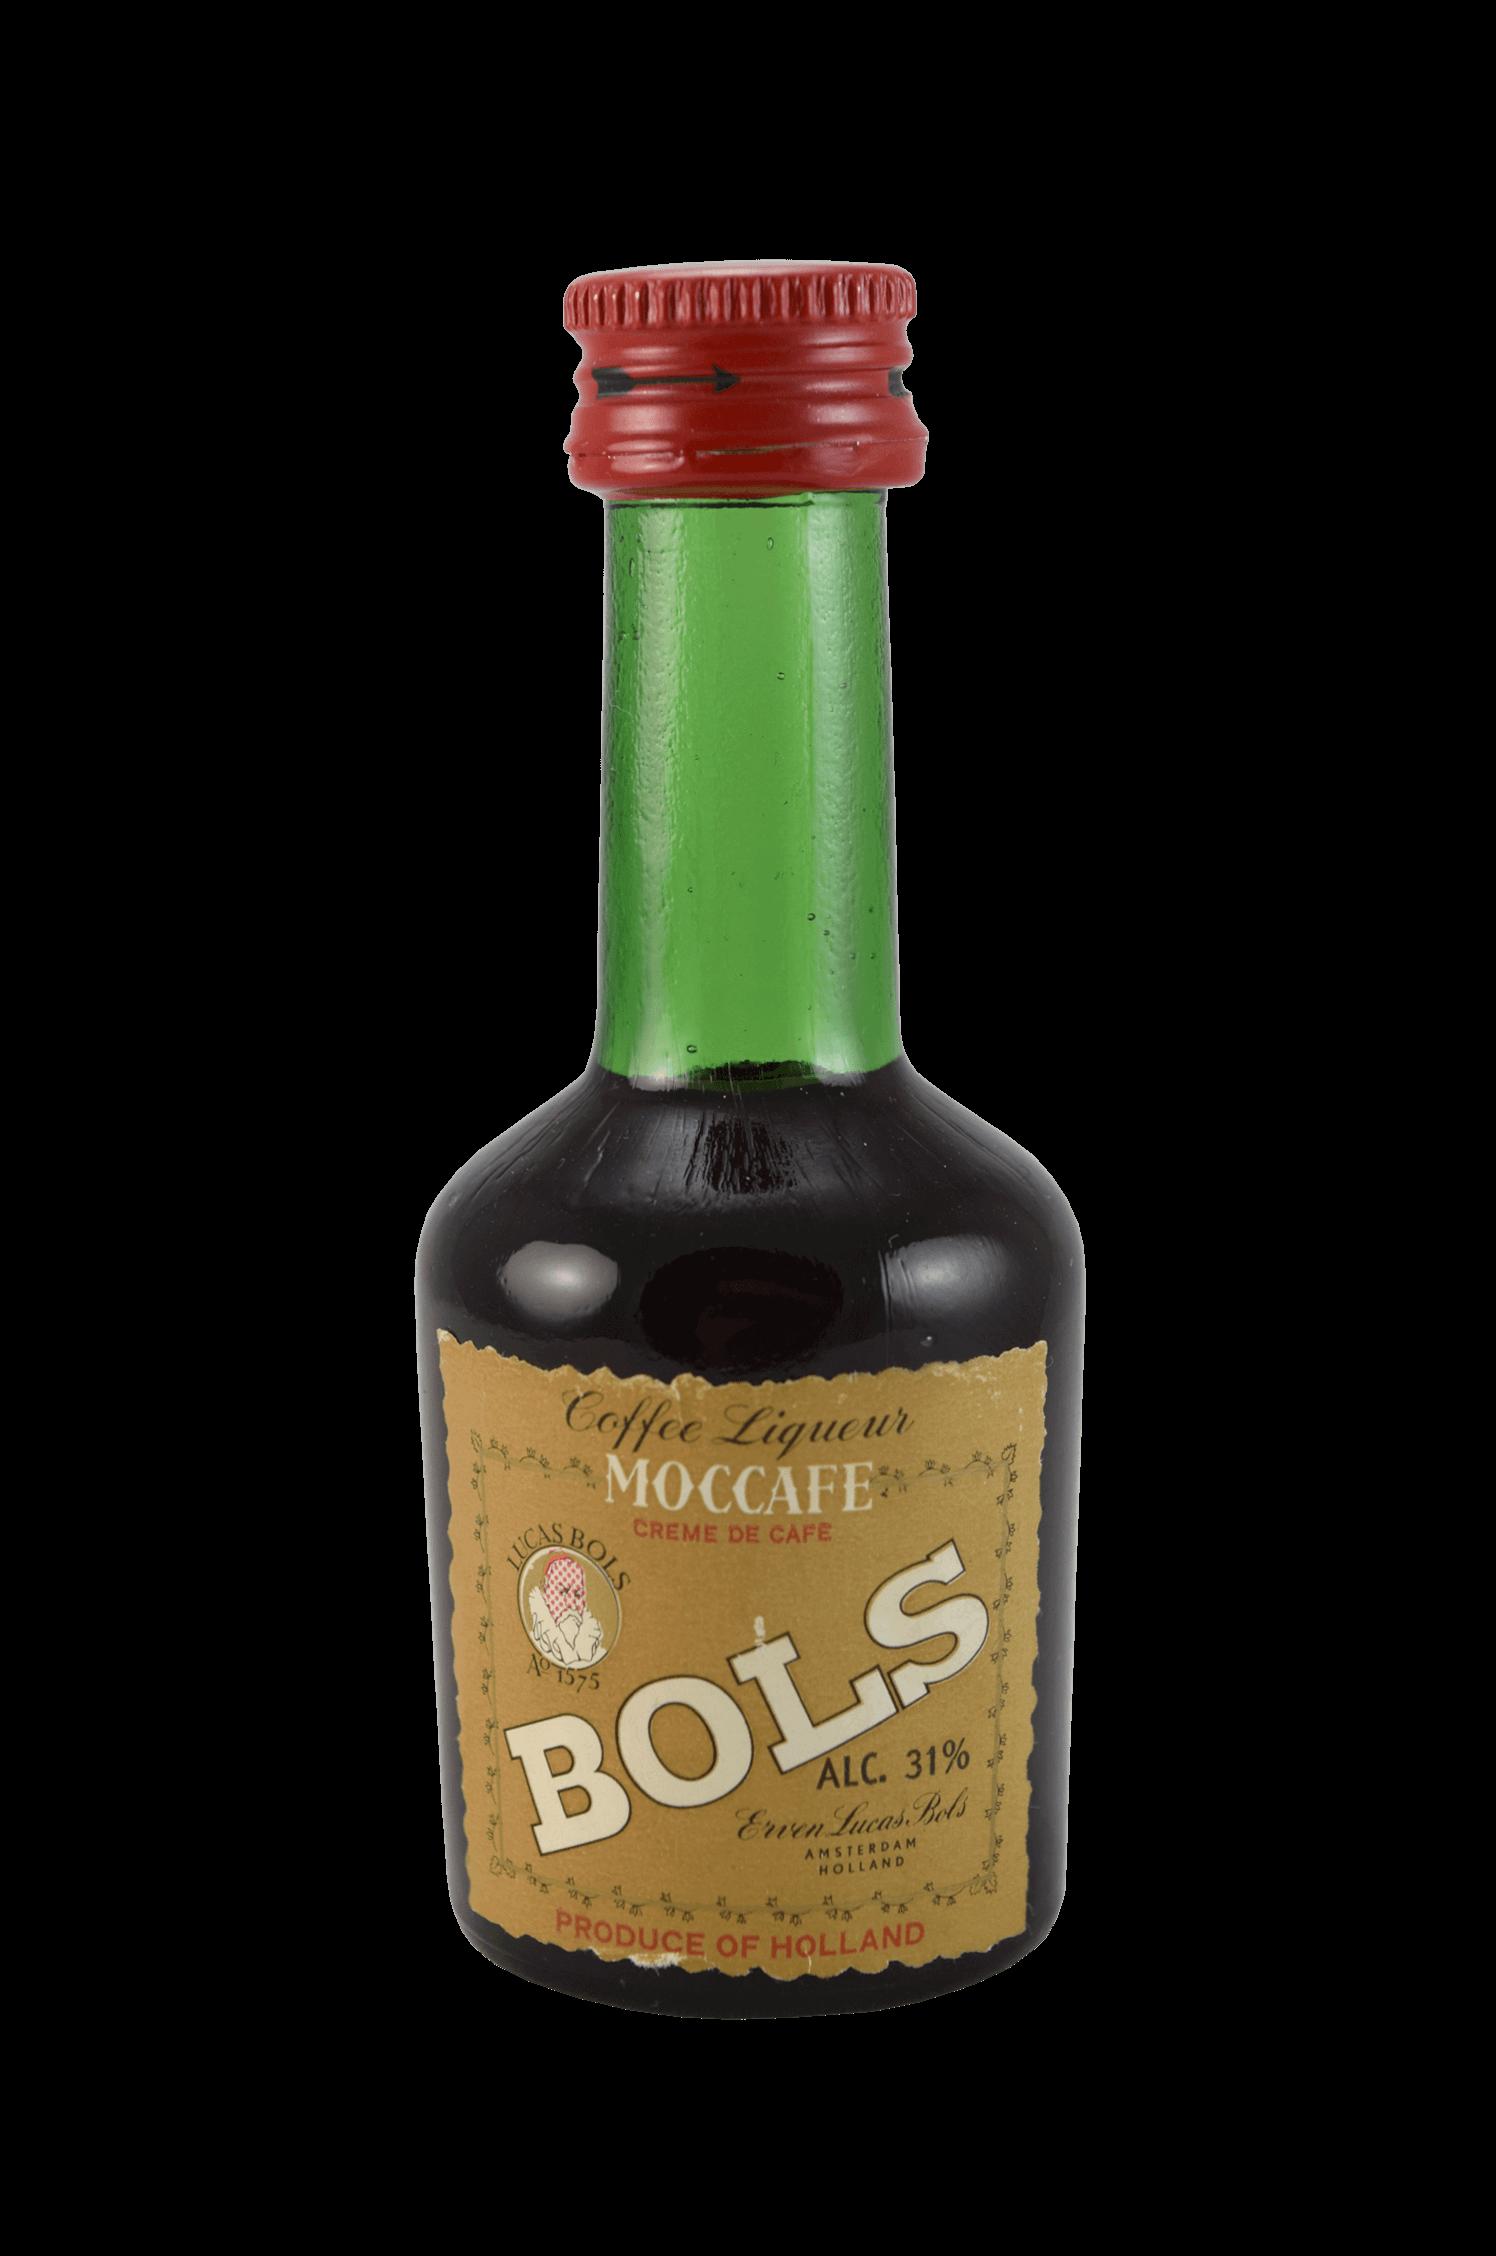 Bols Moccafe Coffee Liqueur